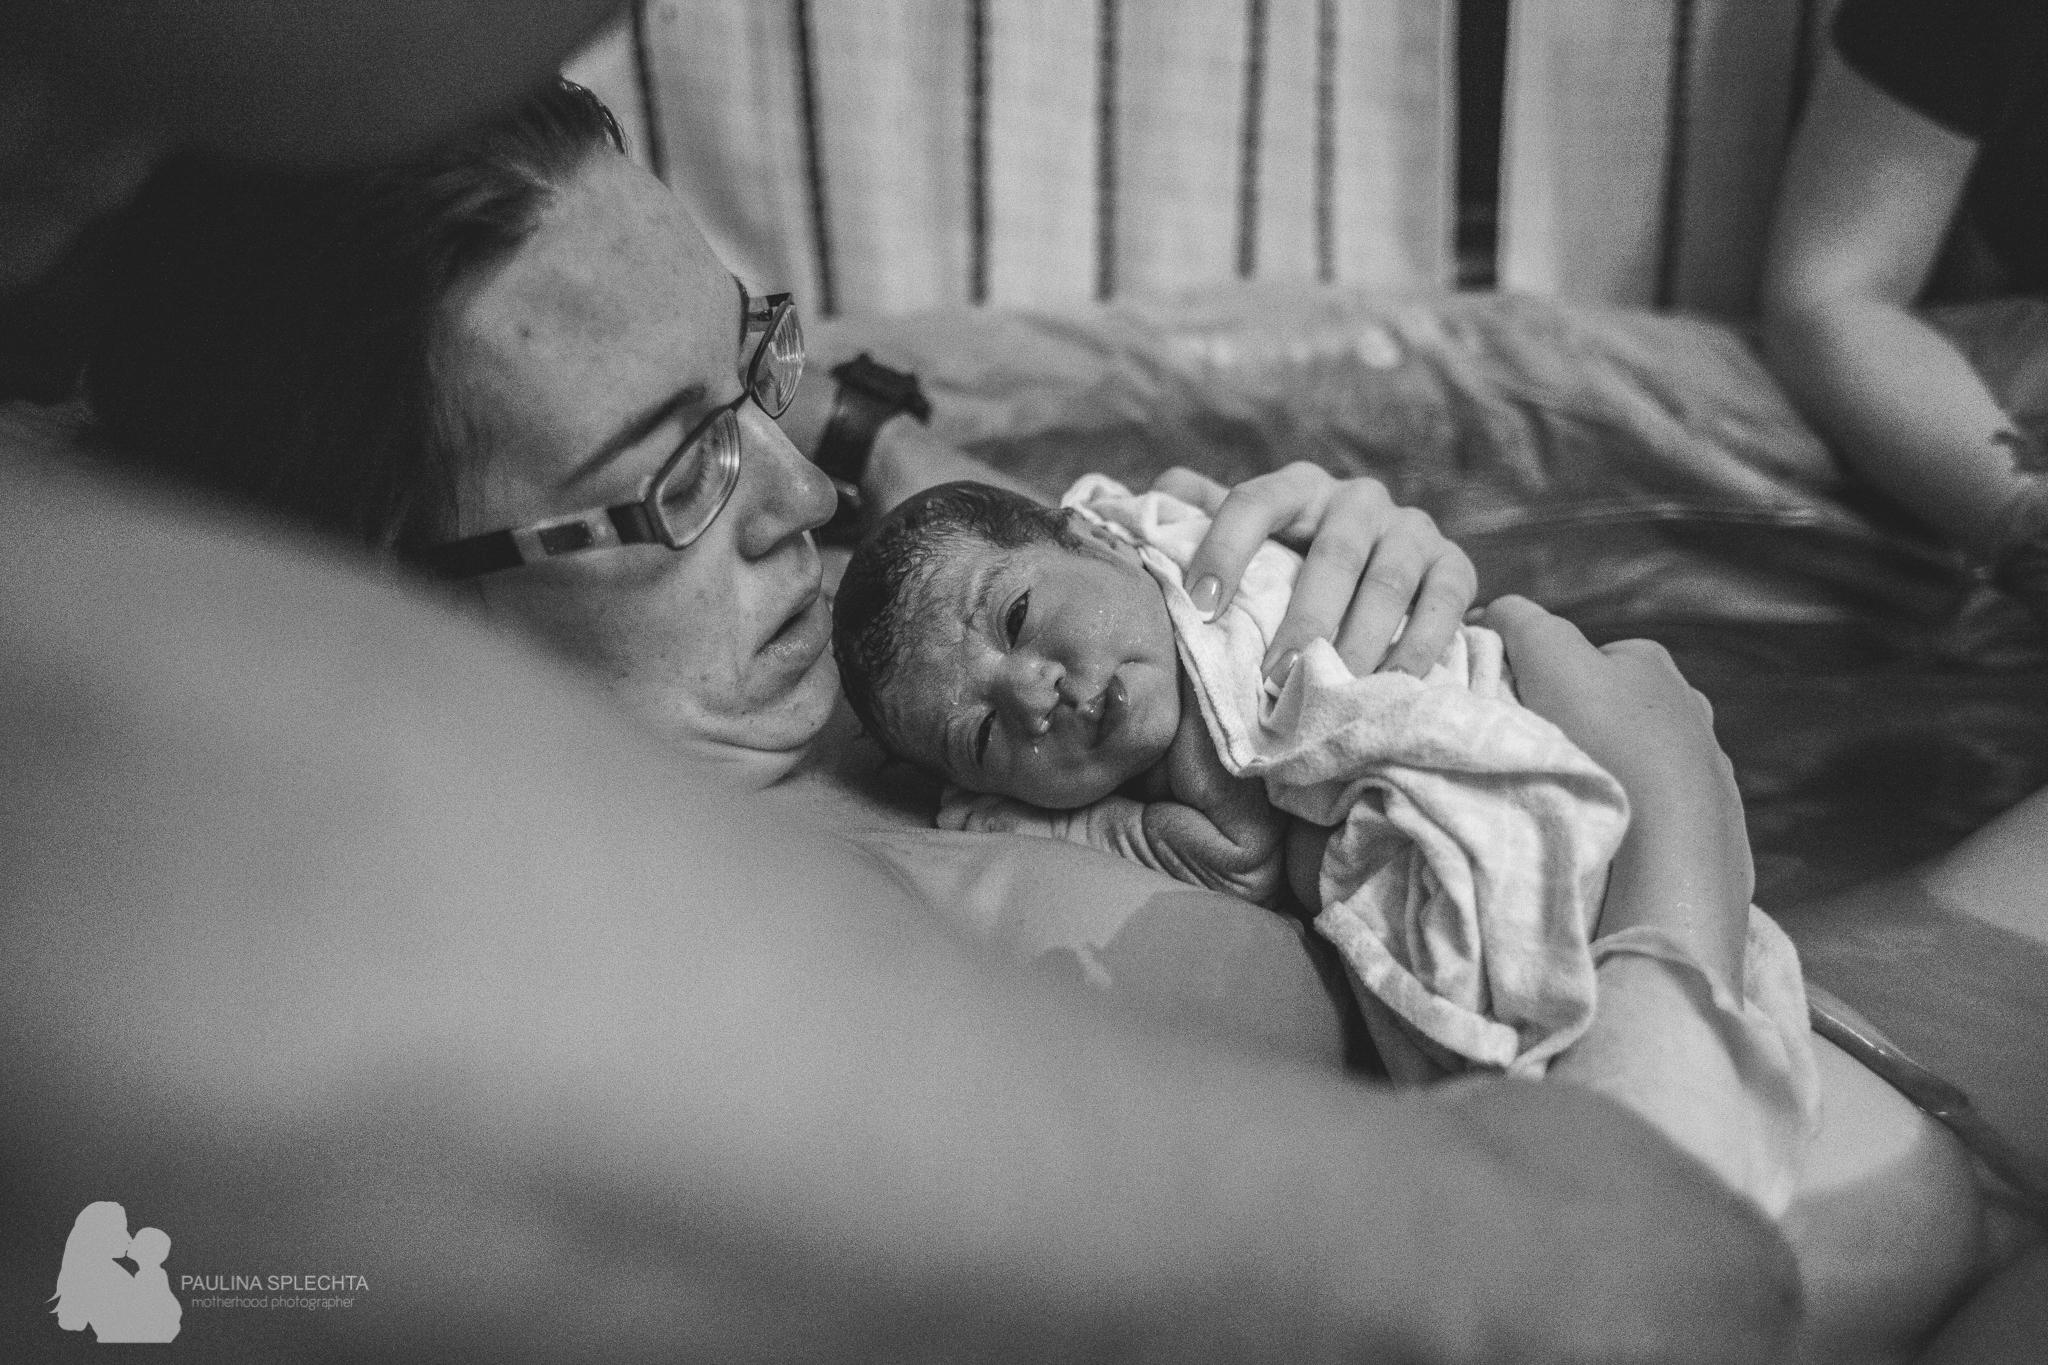 hypnobirthing-birth-center-natural-breastfeeding-delray-beach-boca-hollywood-south-florida-photographer-photography-family-maternity-pregnancy-pregnant-third-trimester-ultrasound-ob-obgyn-midwife-doula-hospital-home-water-tub-prenatal-class-newborn-36.jpg